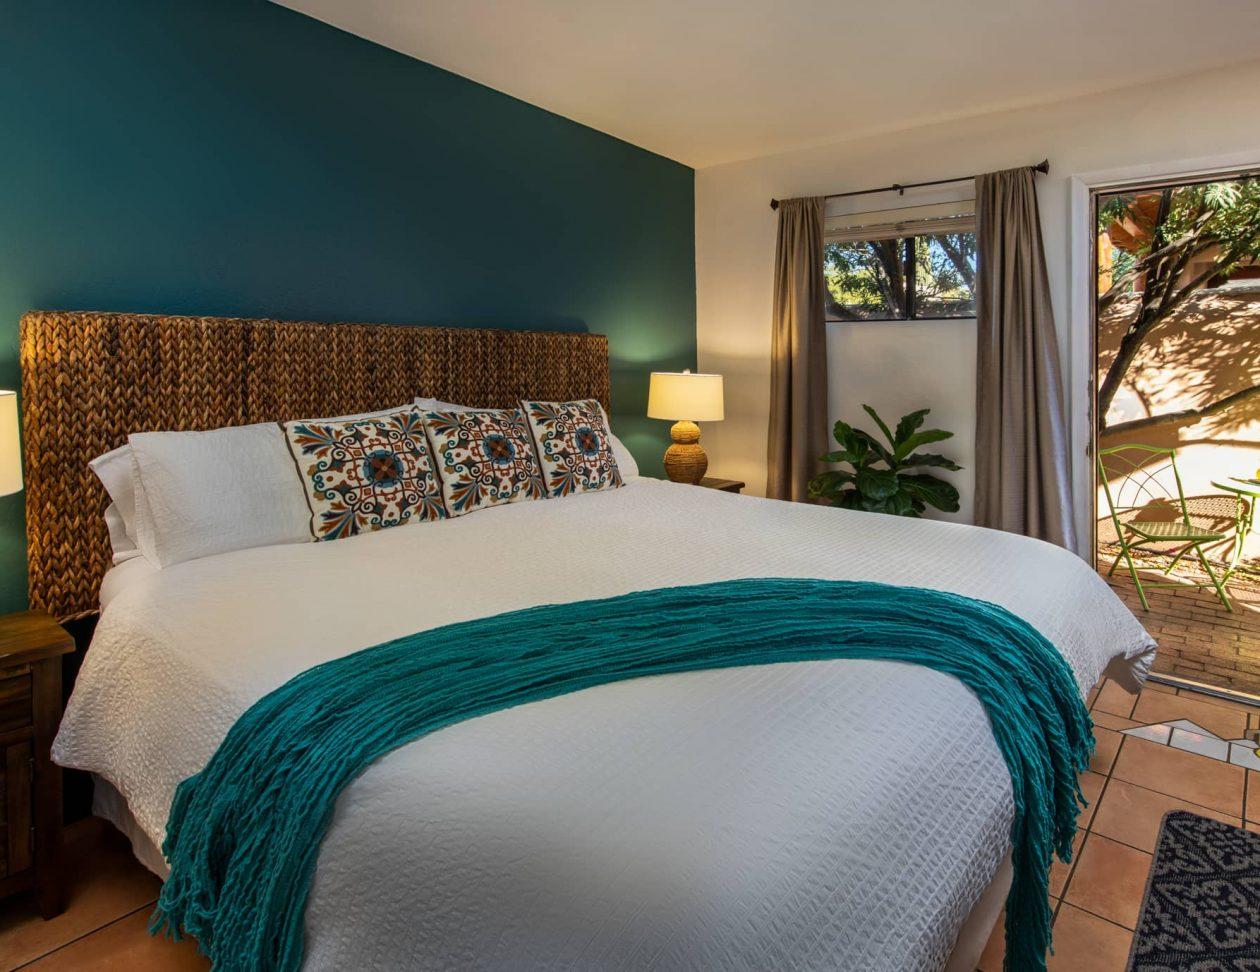 King bed in the Santa Catalina Room at Adobe Rose Inn